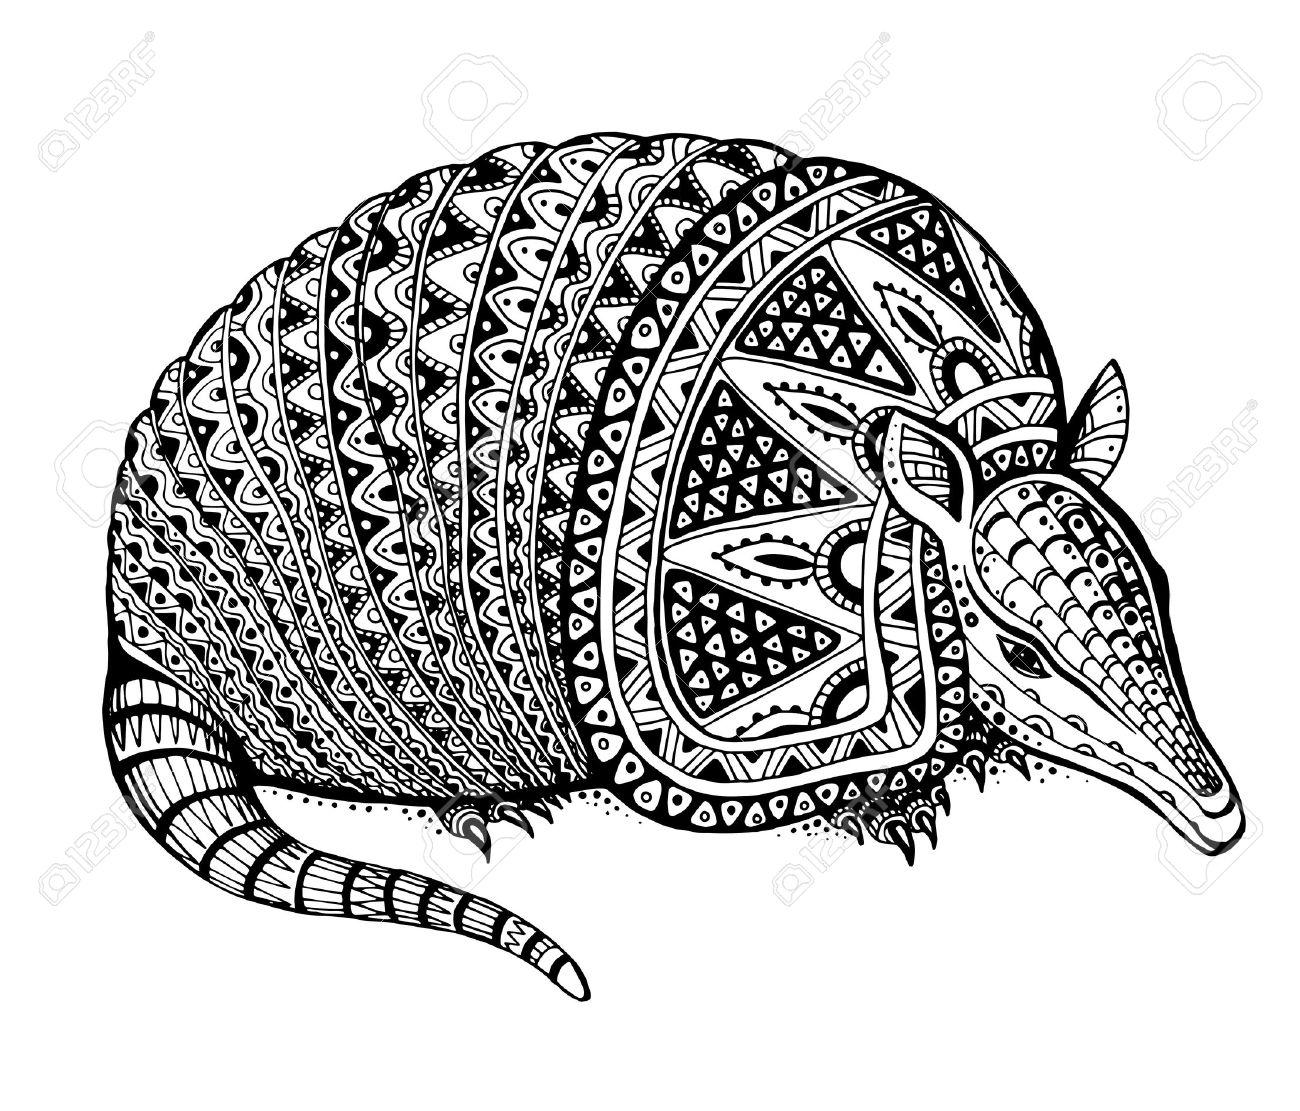 Vector illustration of a totem animal/tattoo.